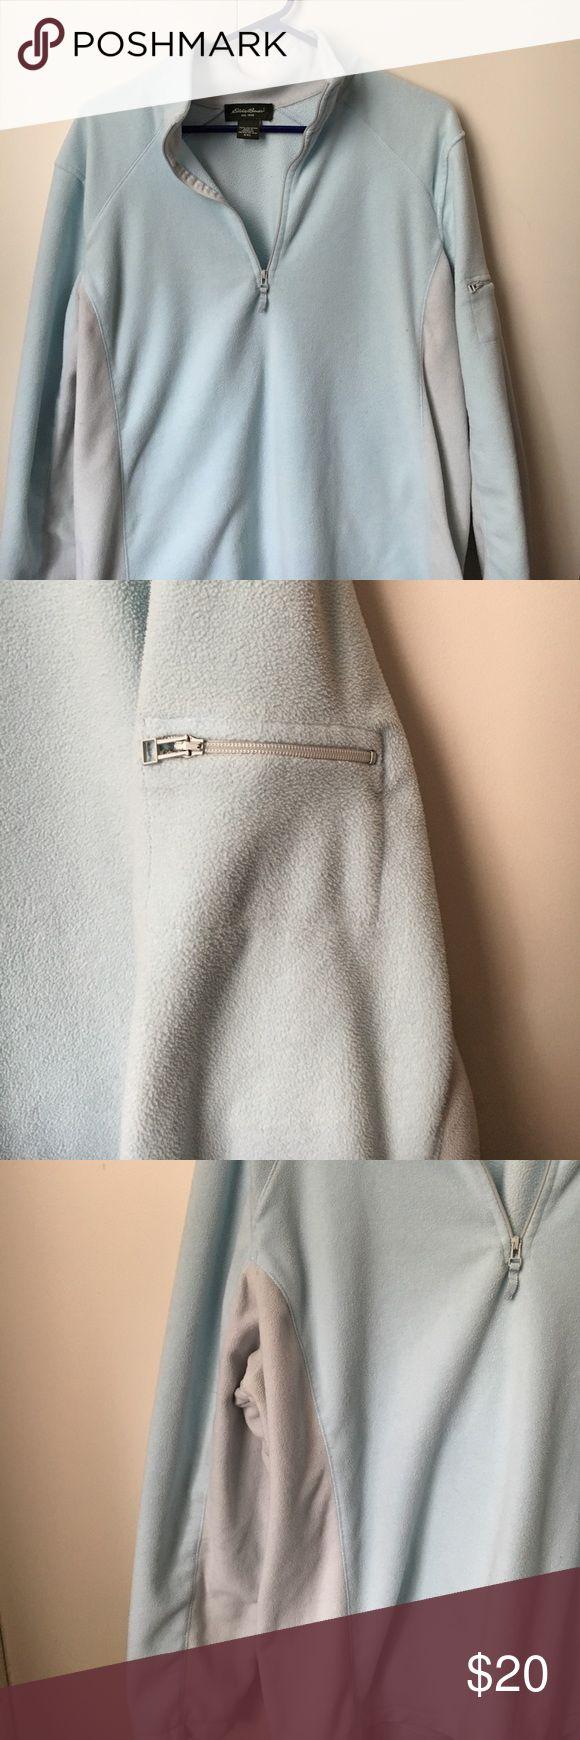 Eddie Bauer fleece pullover XXL Baby blue and light gray XXL Eddie Bauer fleece 1/4 zip pullover. EUC.  Has zippered pocket on sleeve Eddie Bauer Tops Sweatshirts & Hoodies